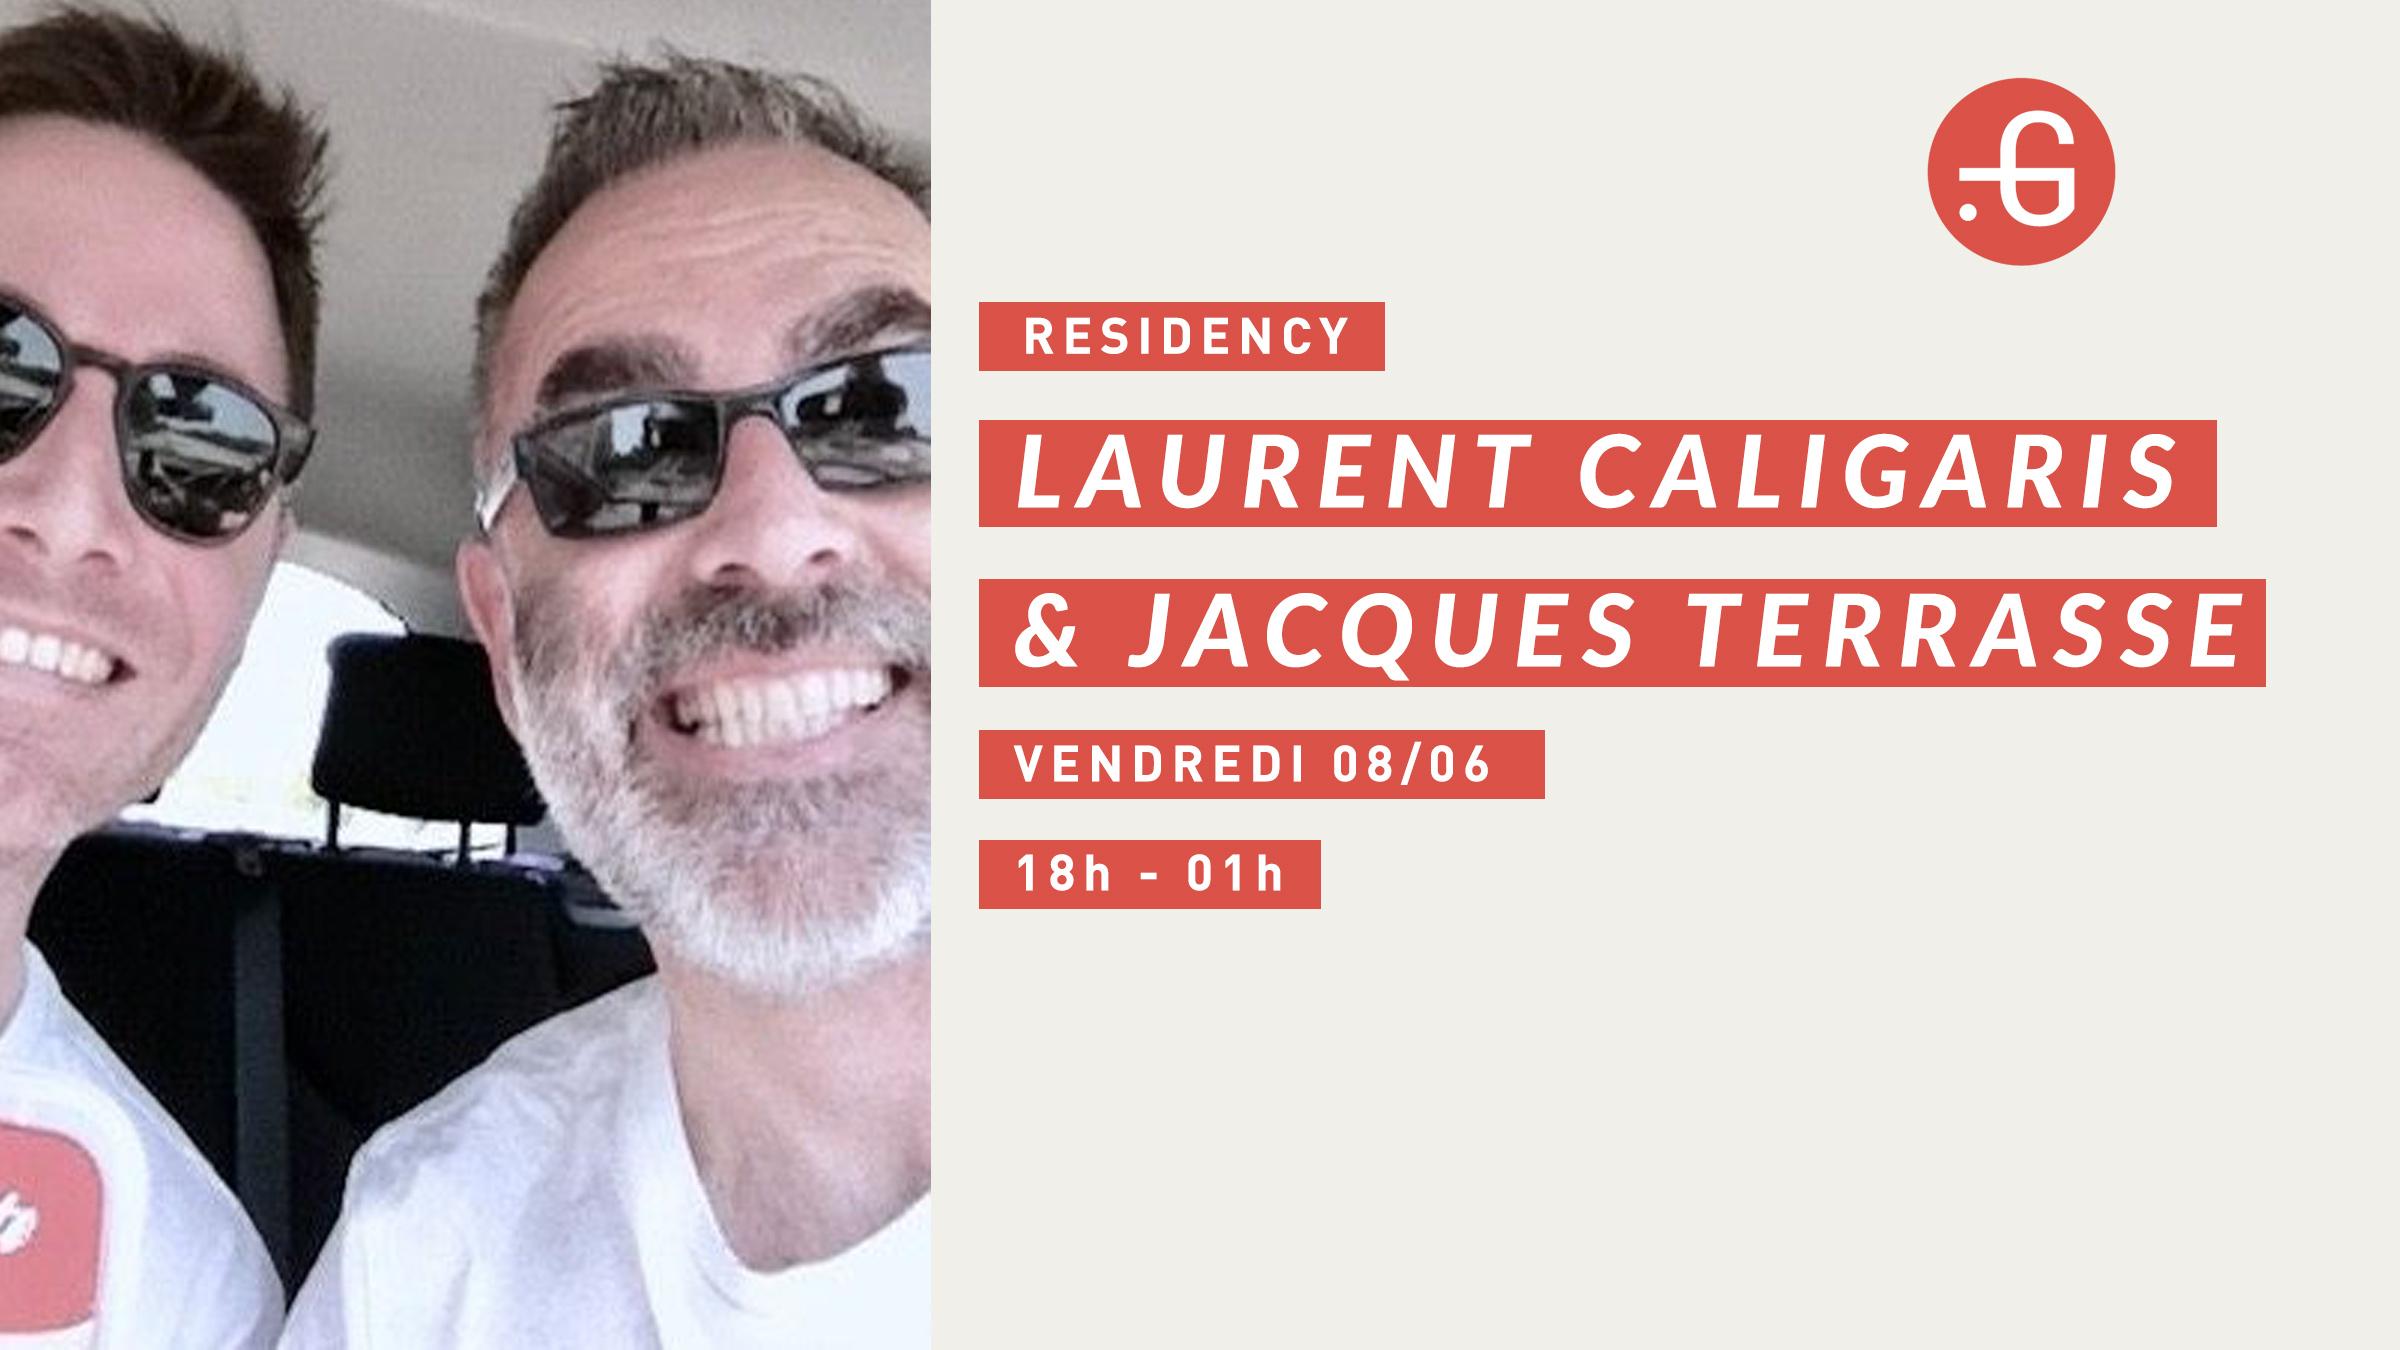 Jacques terrasse, 08/06